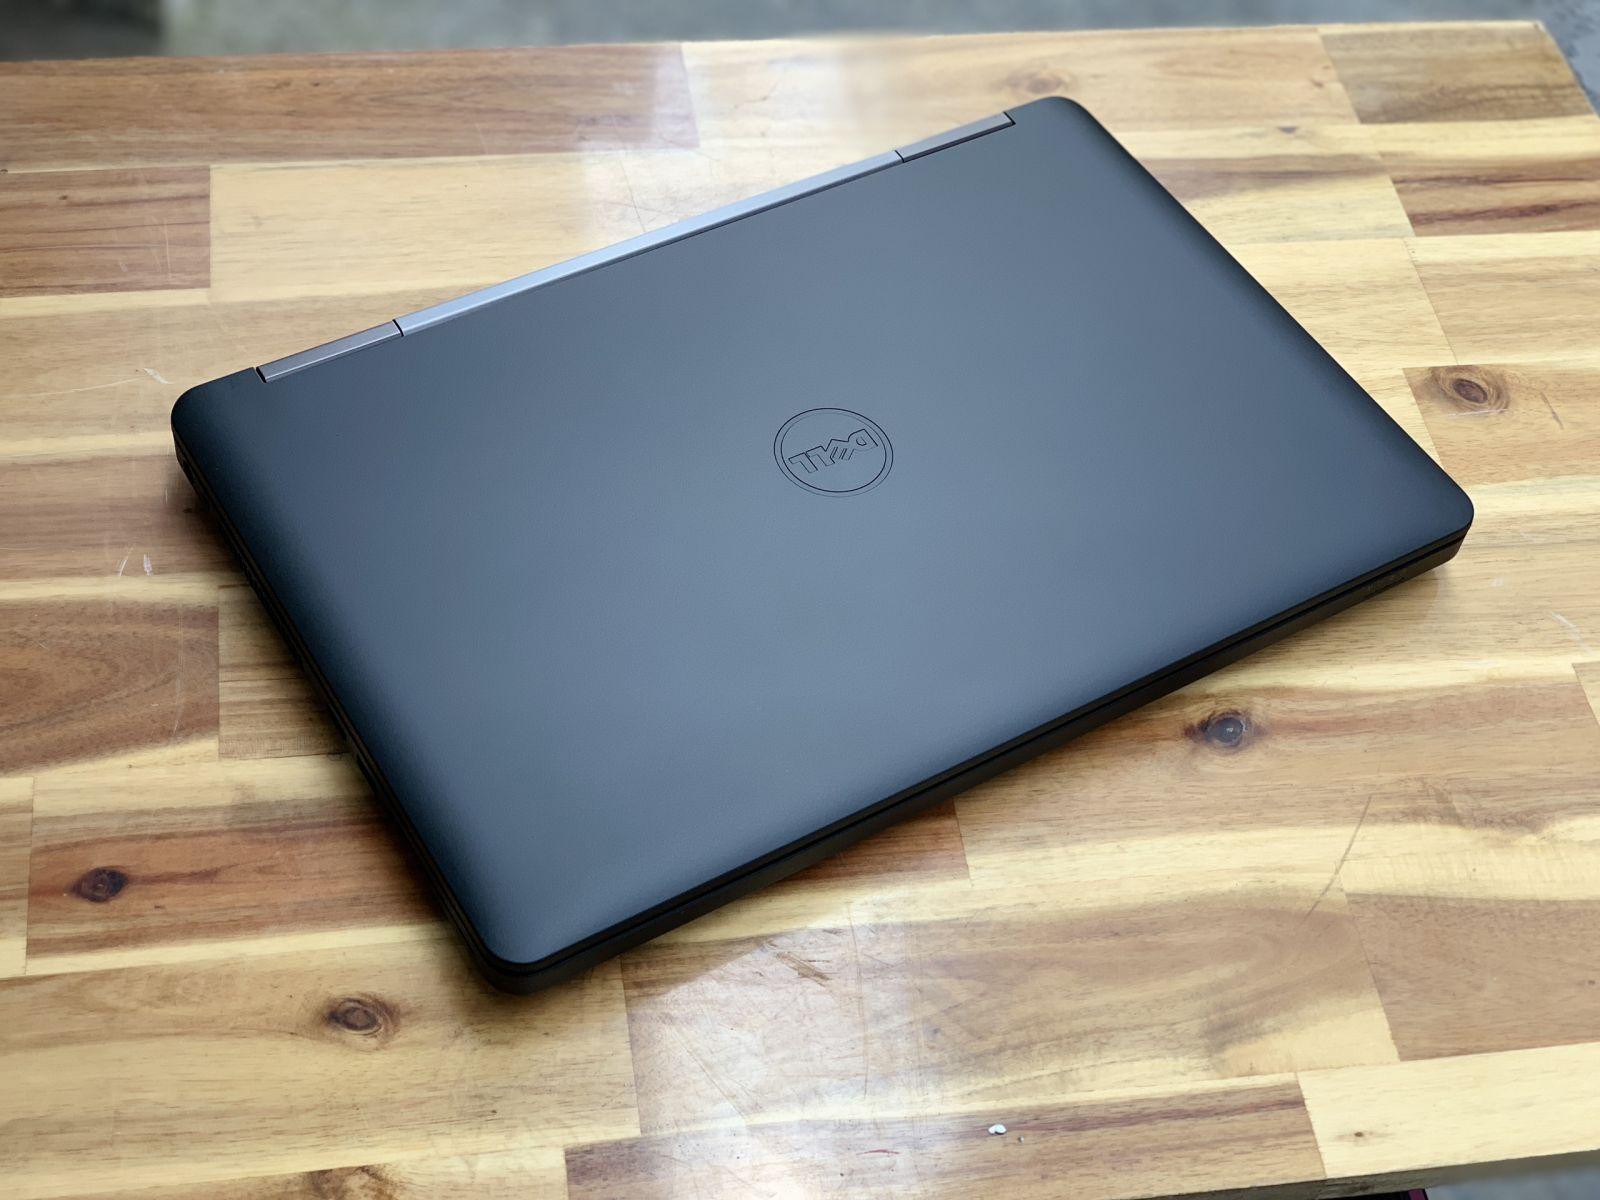 Dell latitude e5540 i5 giá rẻ